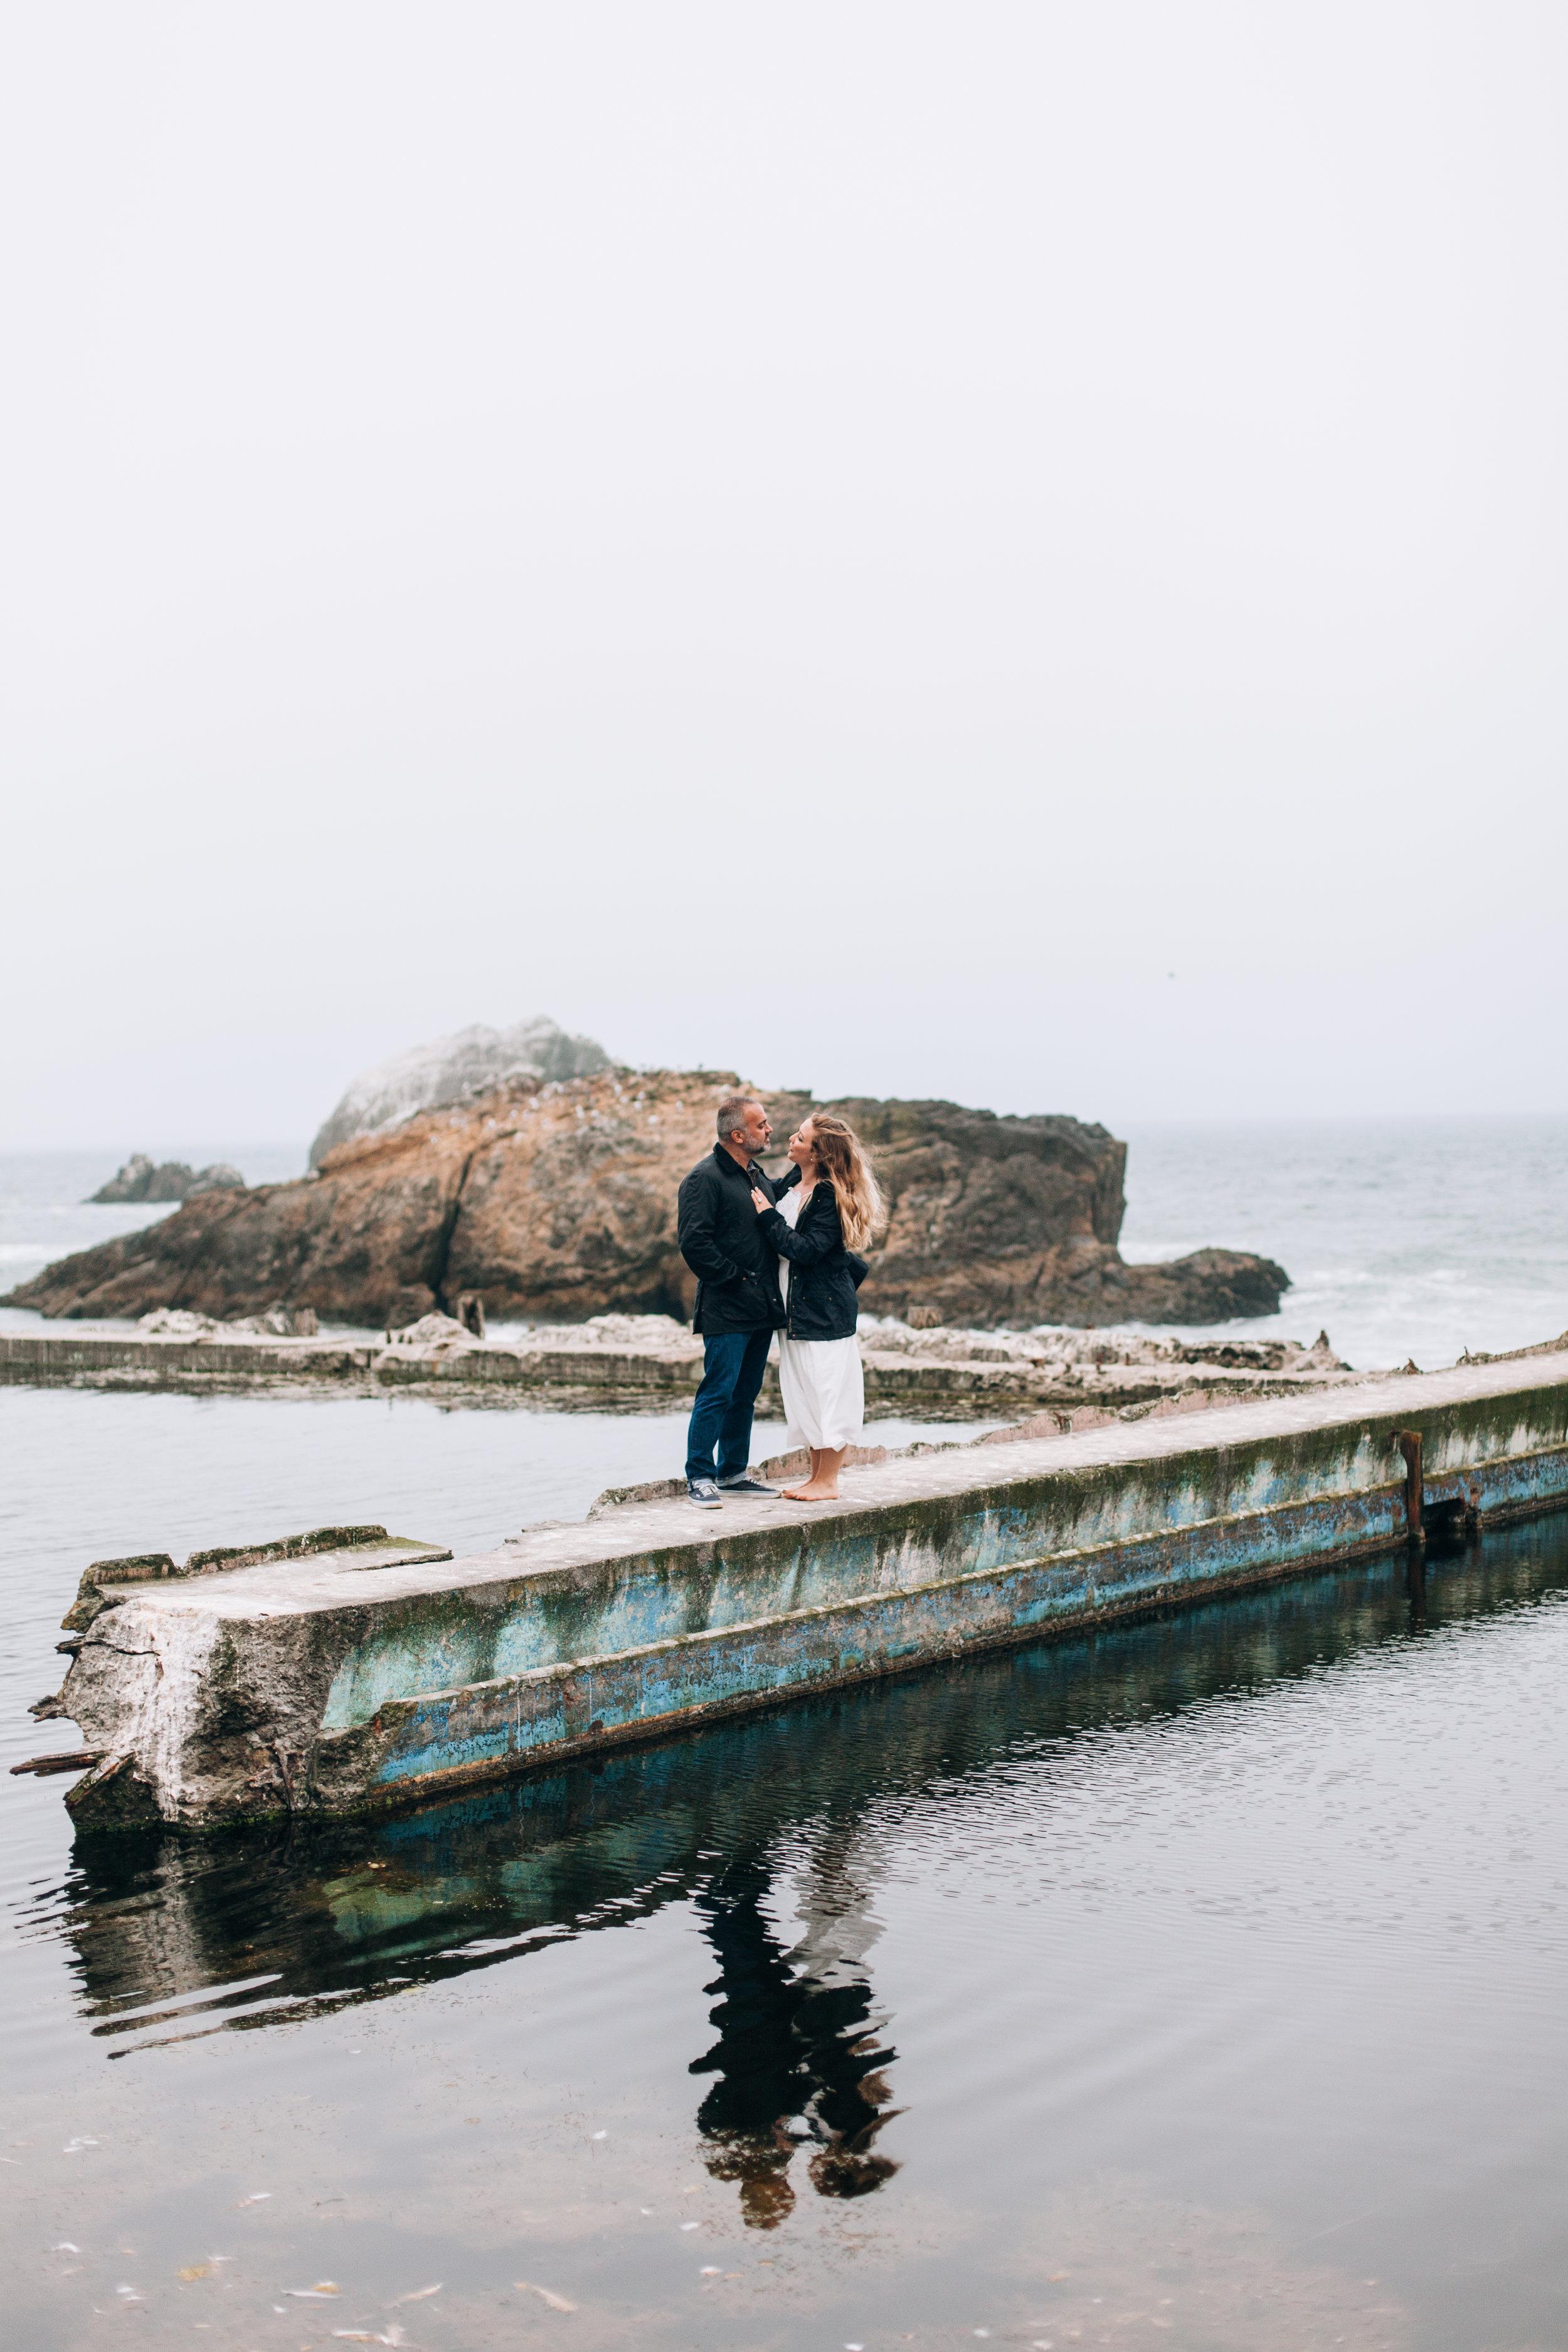 KaraNixonWeddings-SanFrancisco-Engagement-26.jpg